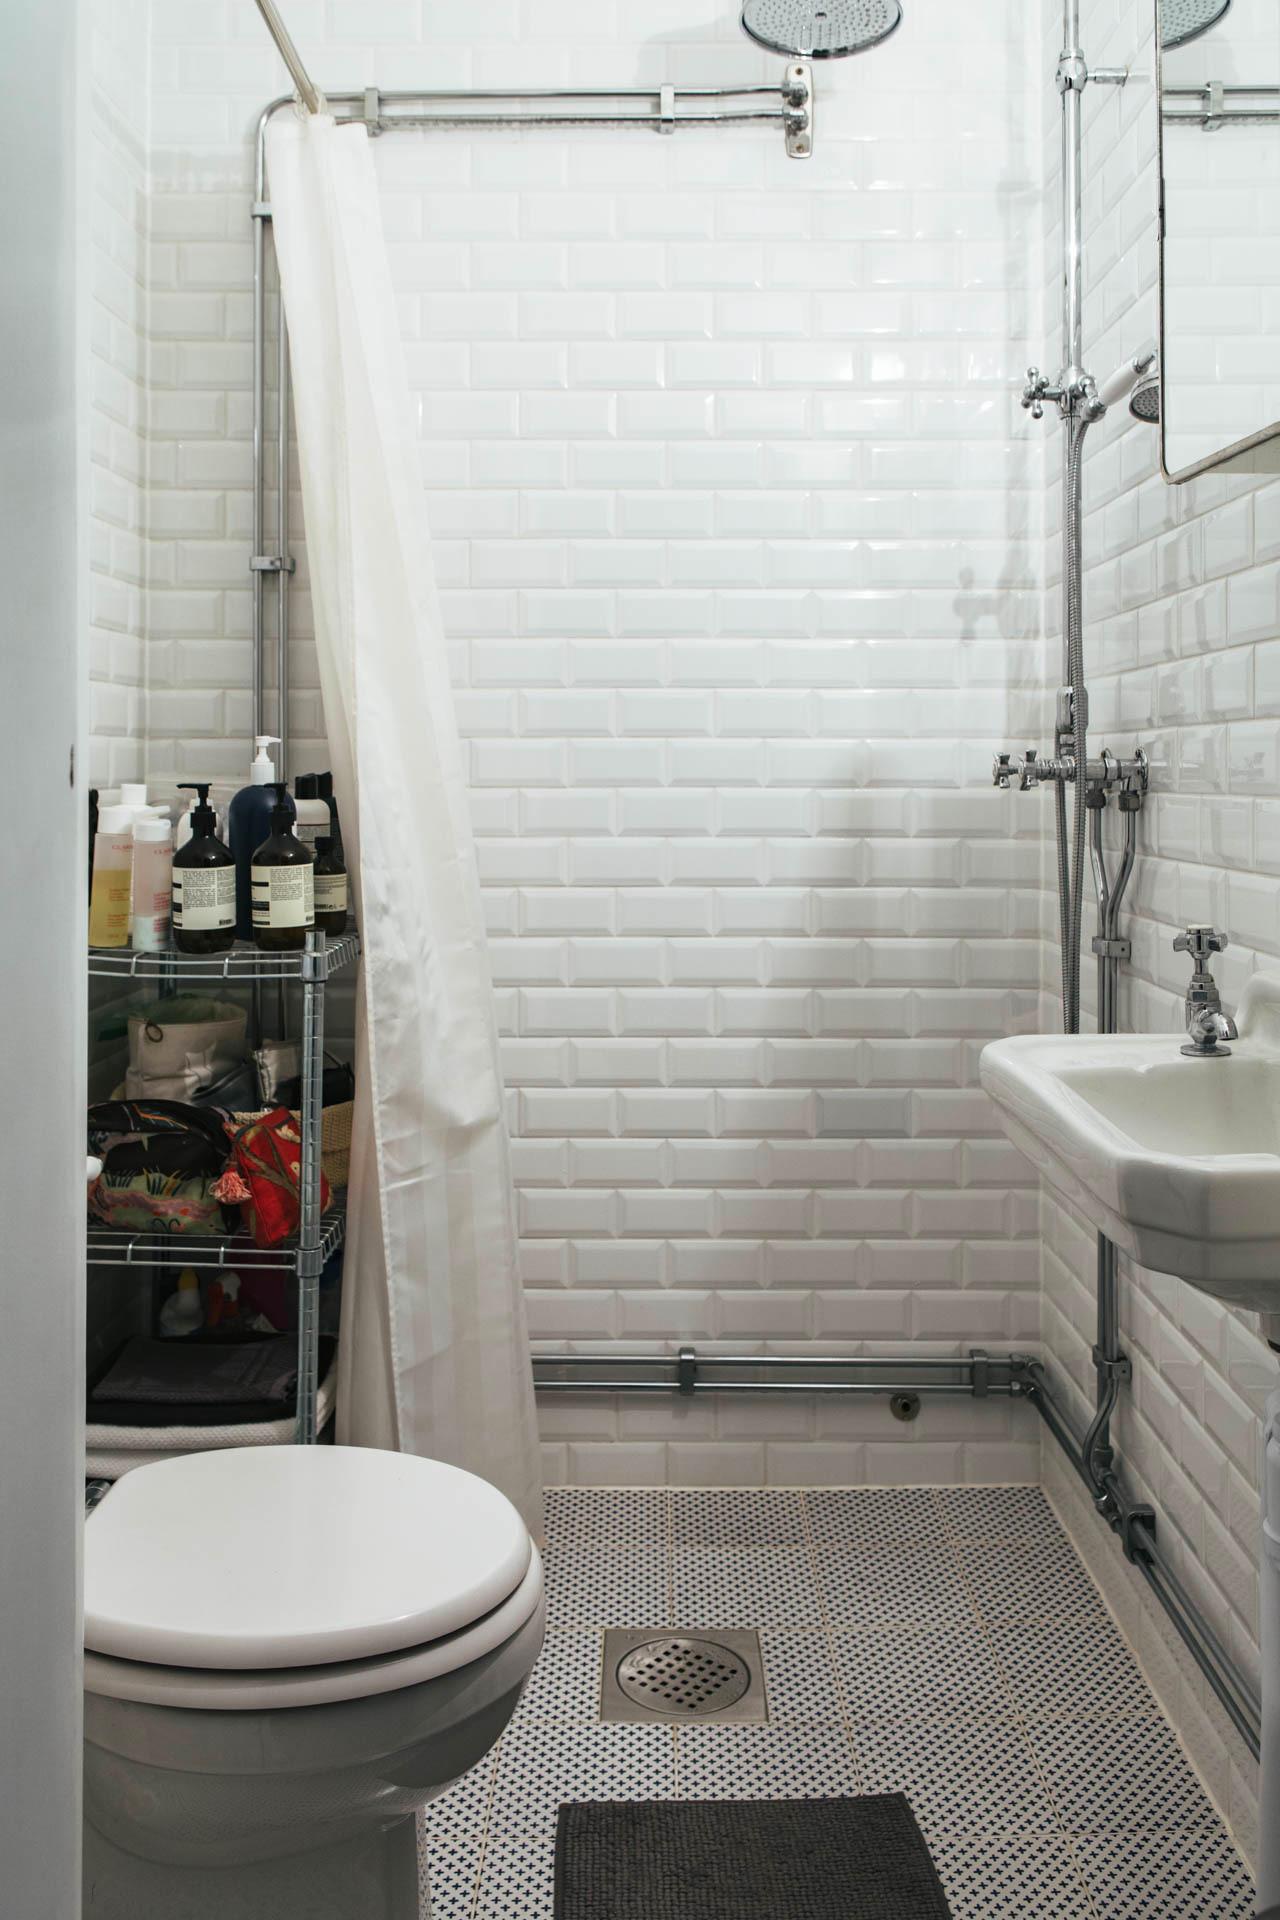 Интерьер стокгольмской квартиры площадью 33 кв. метра